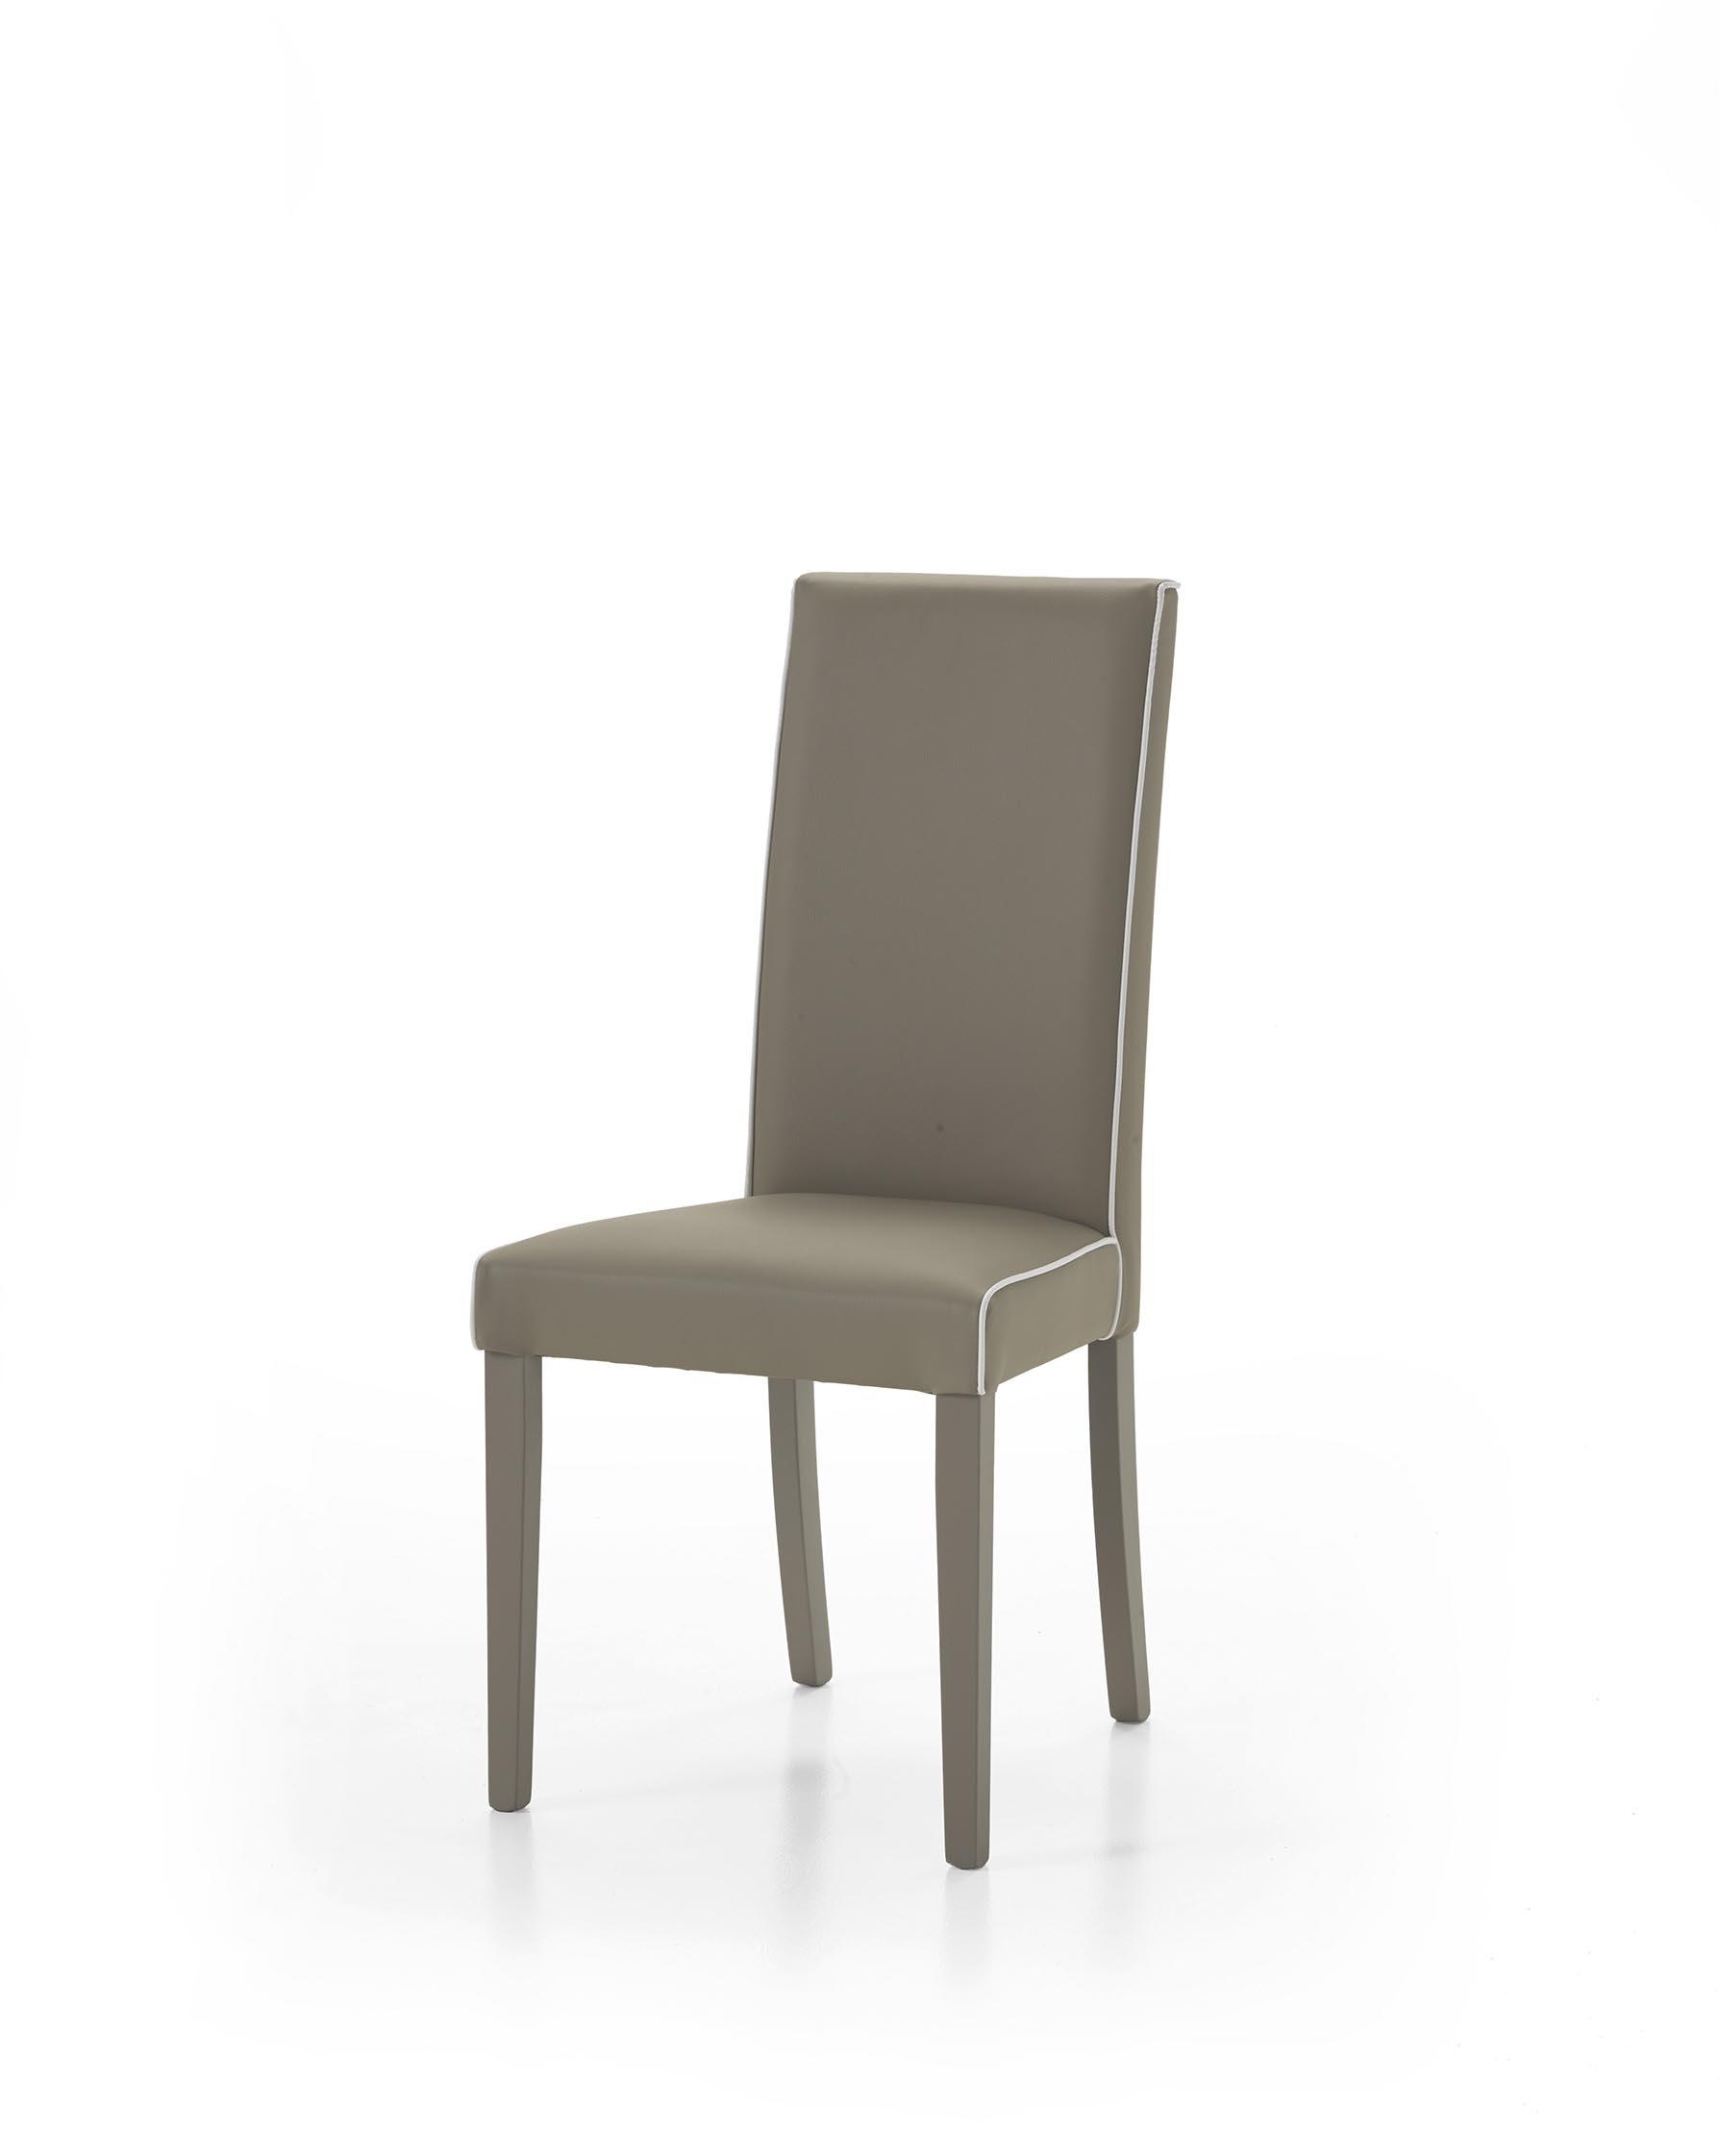 Sala da pranzo completa di tavolo sedie mobile tve - Sedie da sala da pranzo ...